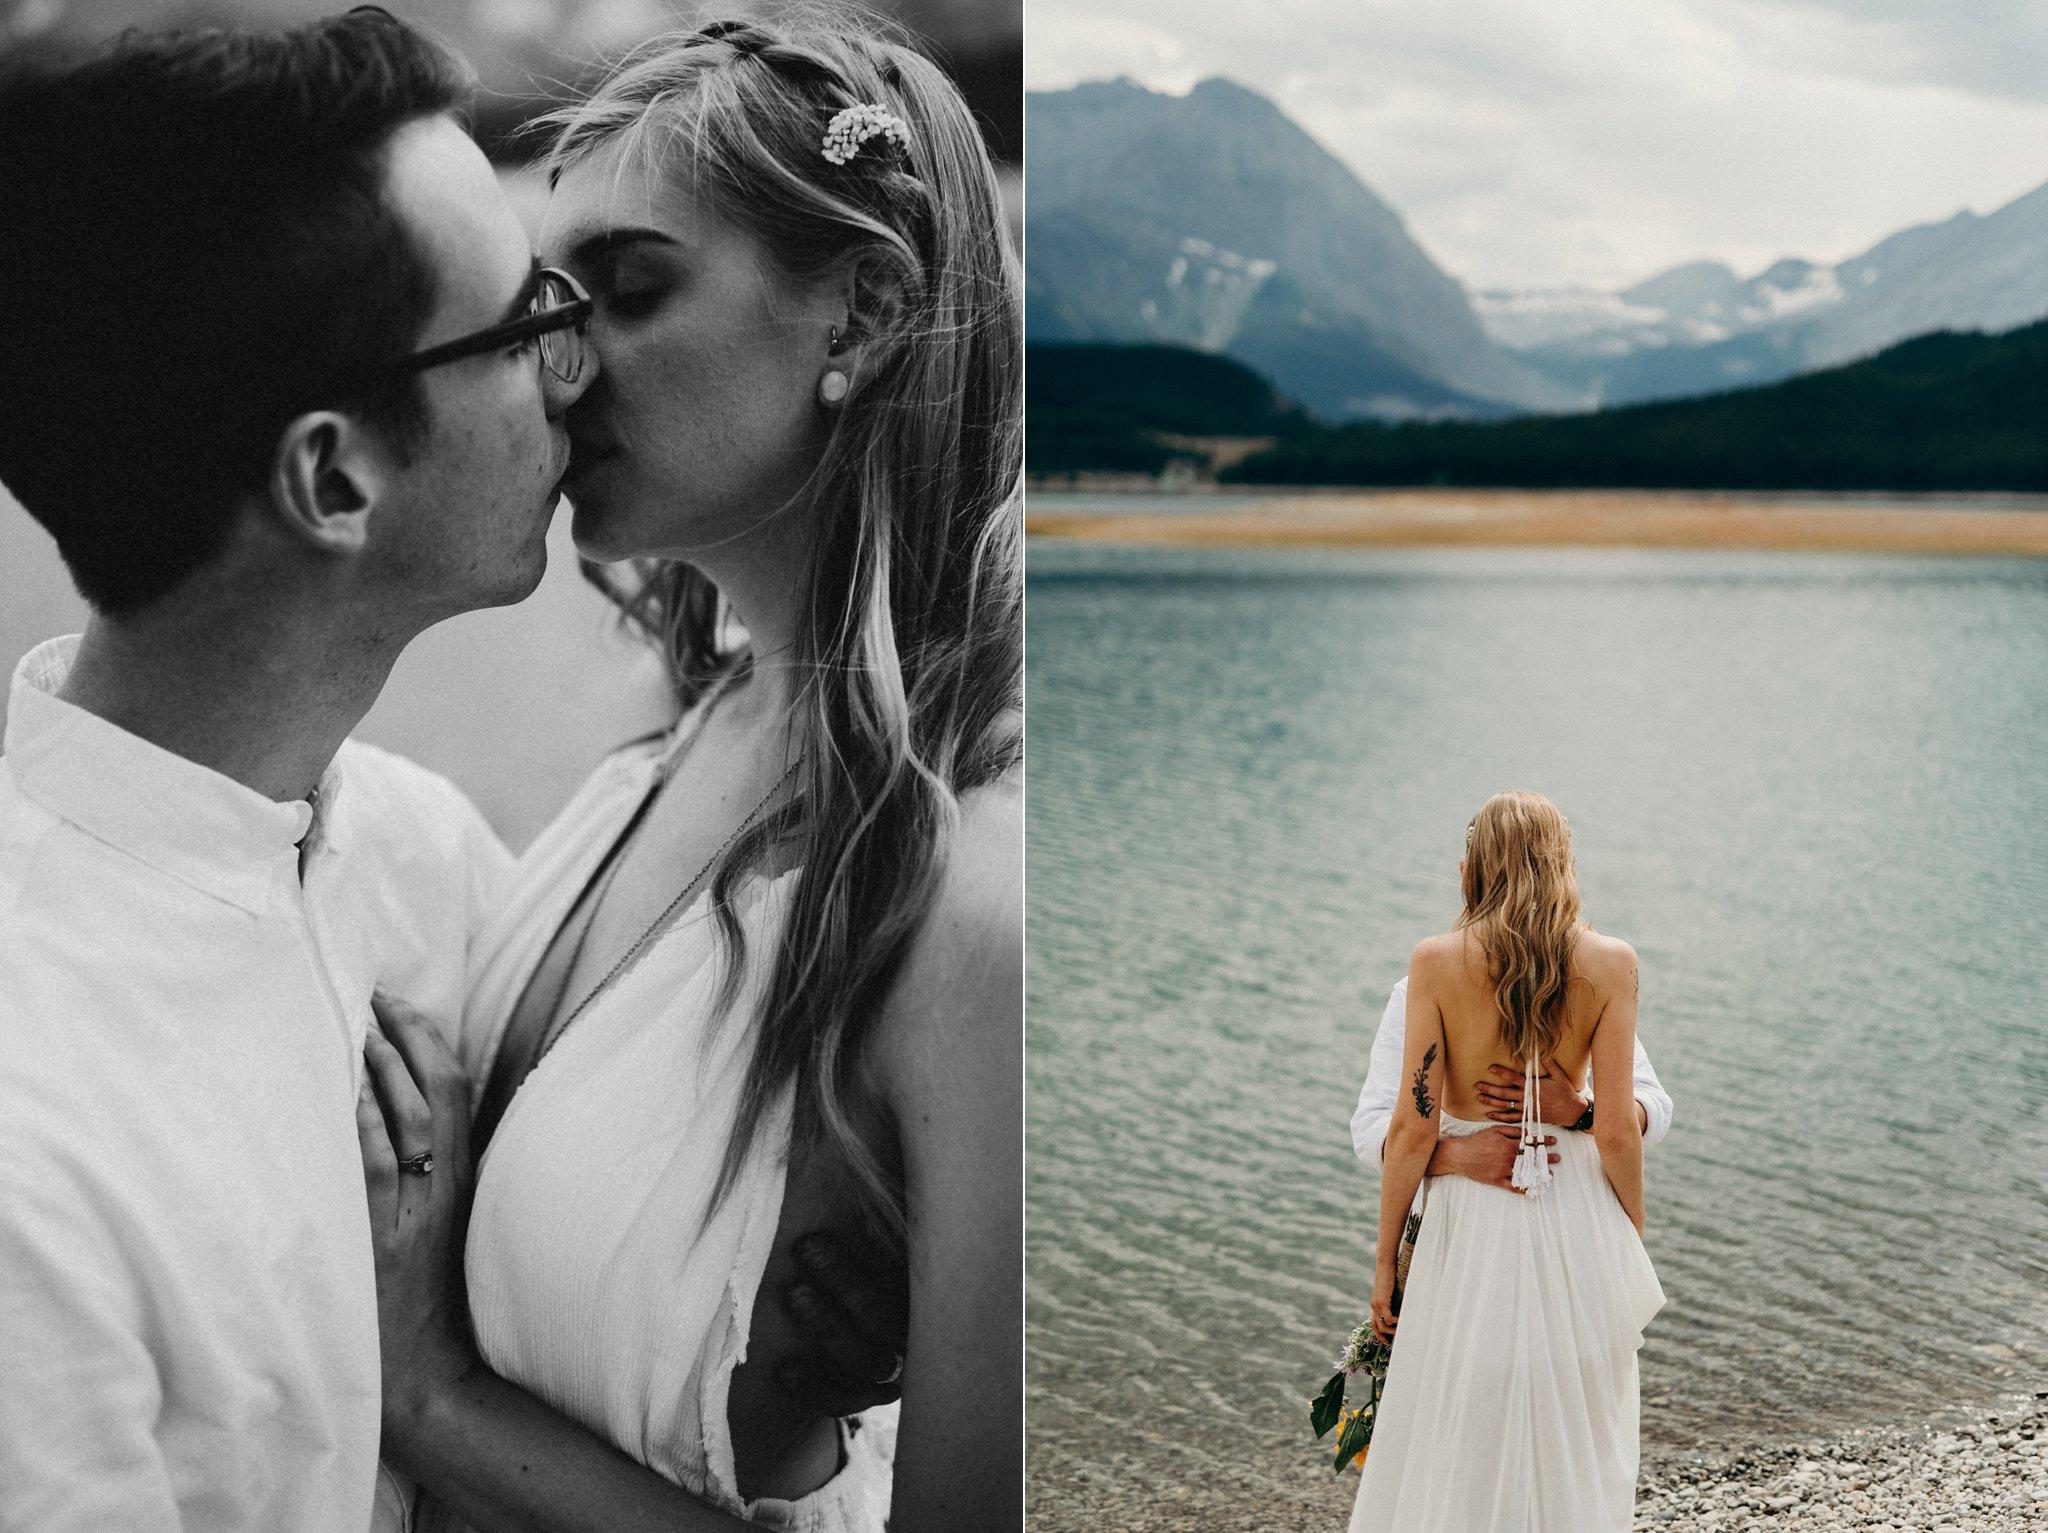 kaihla_tonai_intimate_wedding_elopement_photographer_6401.jpg